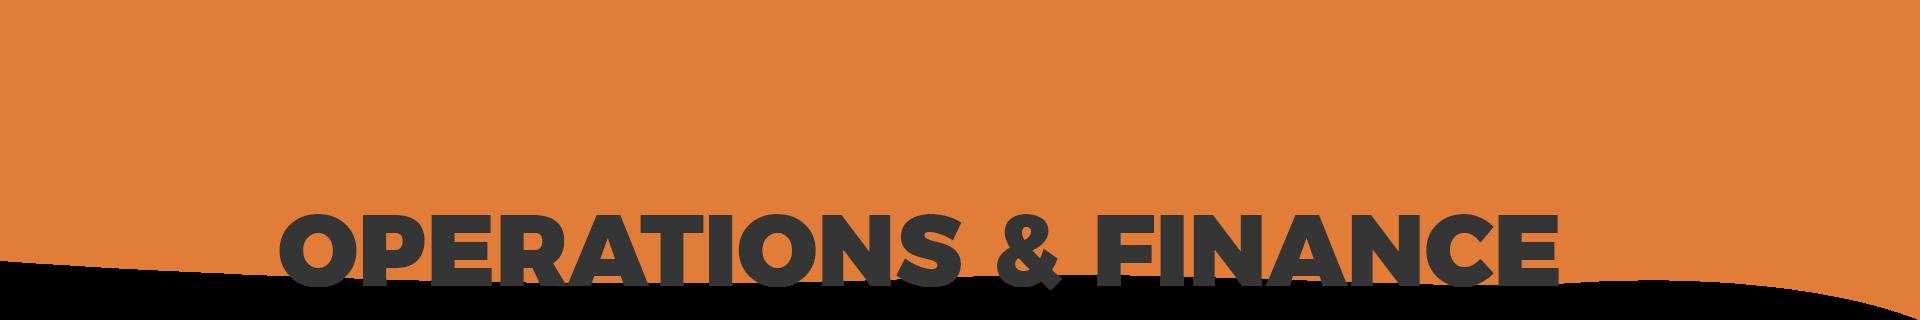 Cloud Harmonics Operations and Finance